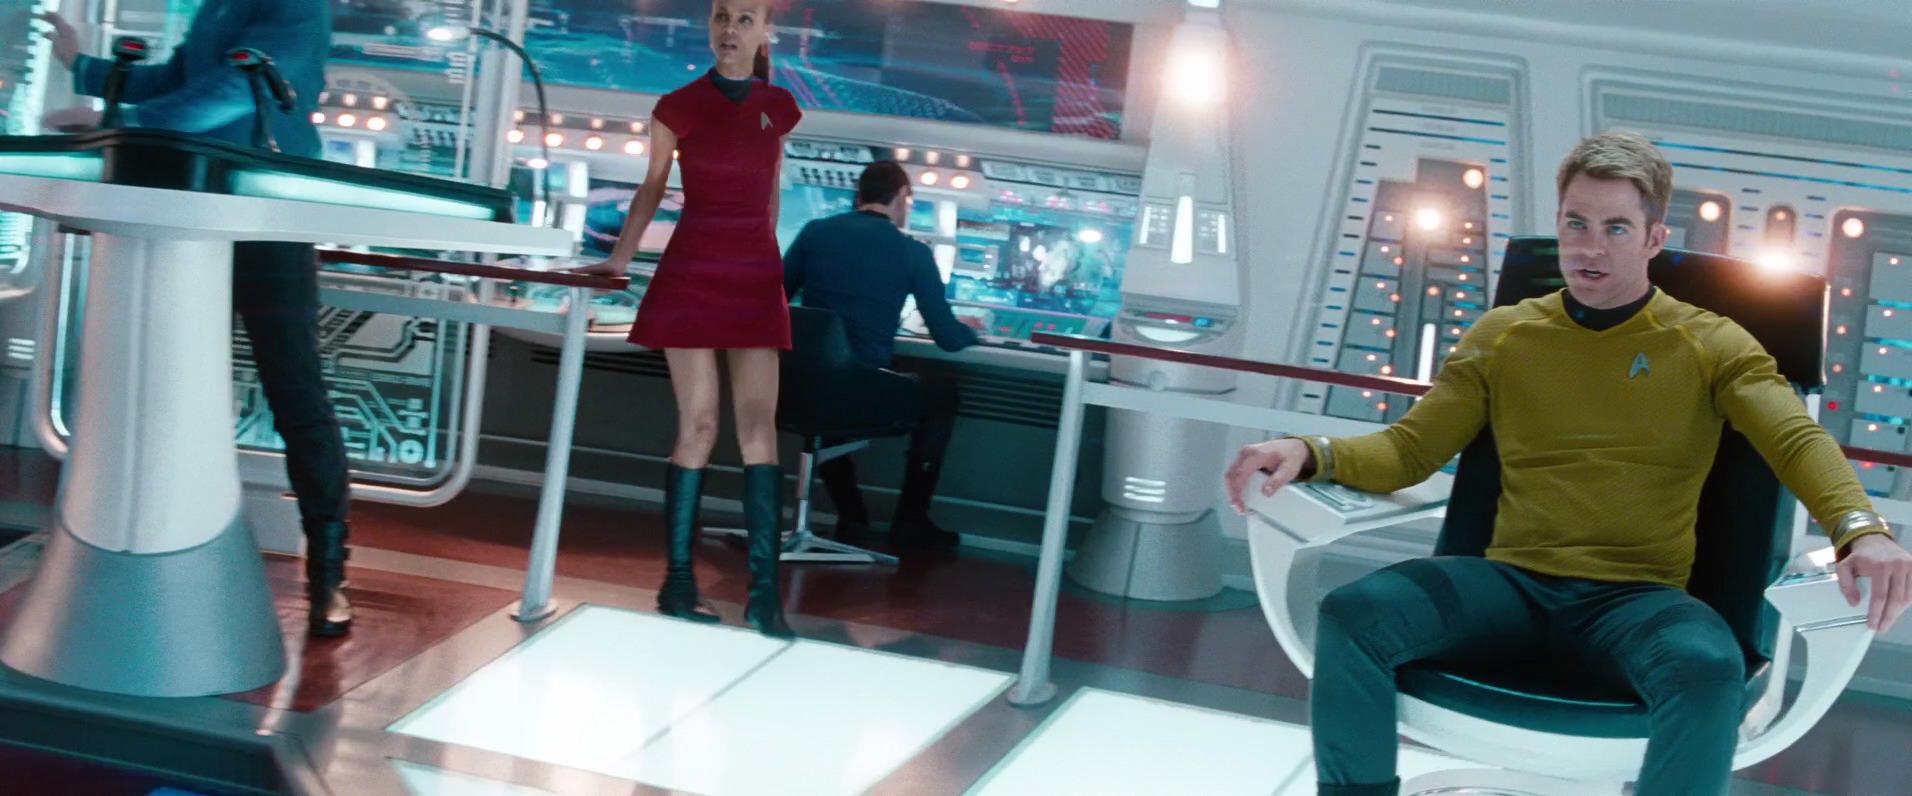 Star Trek: Into Darkness (2014) via movie-screencaps.com